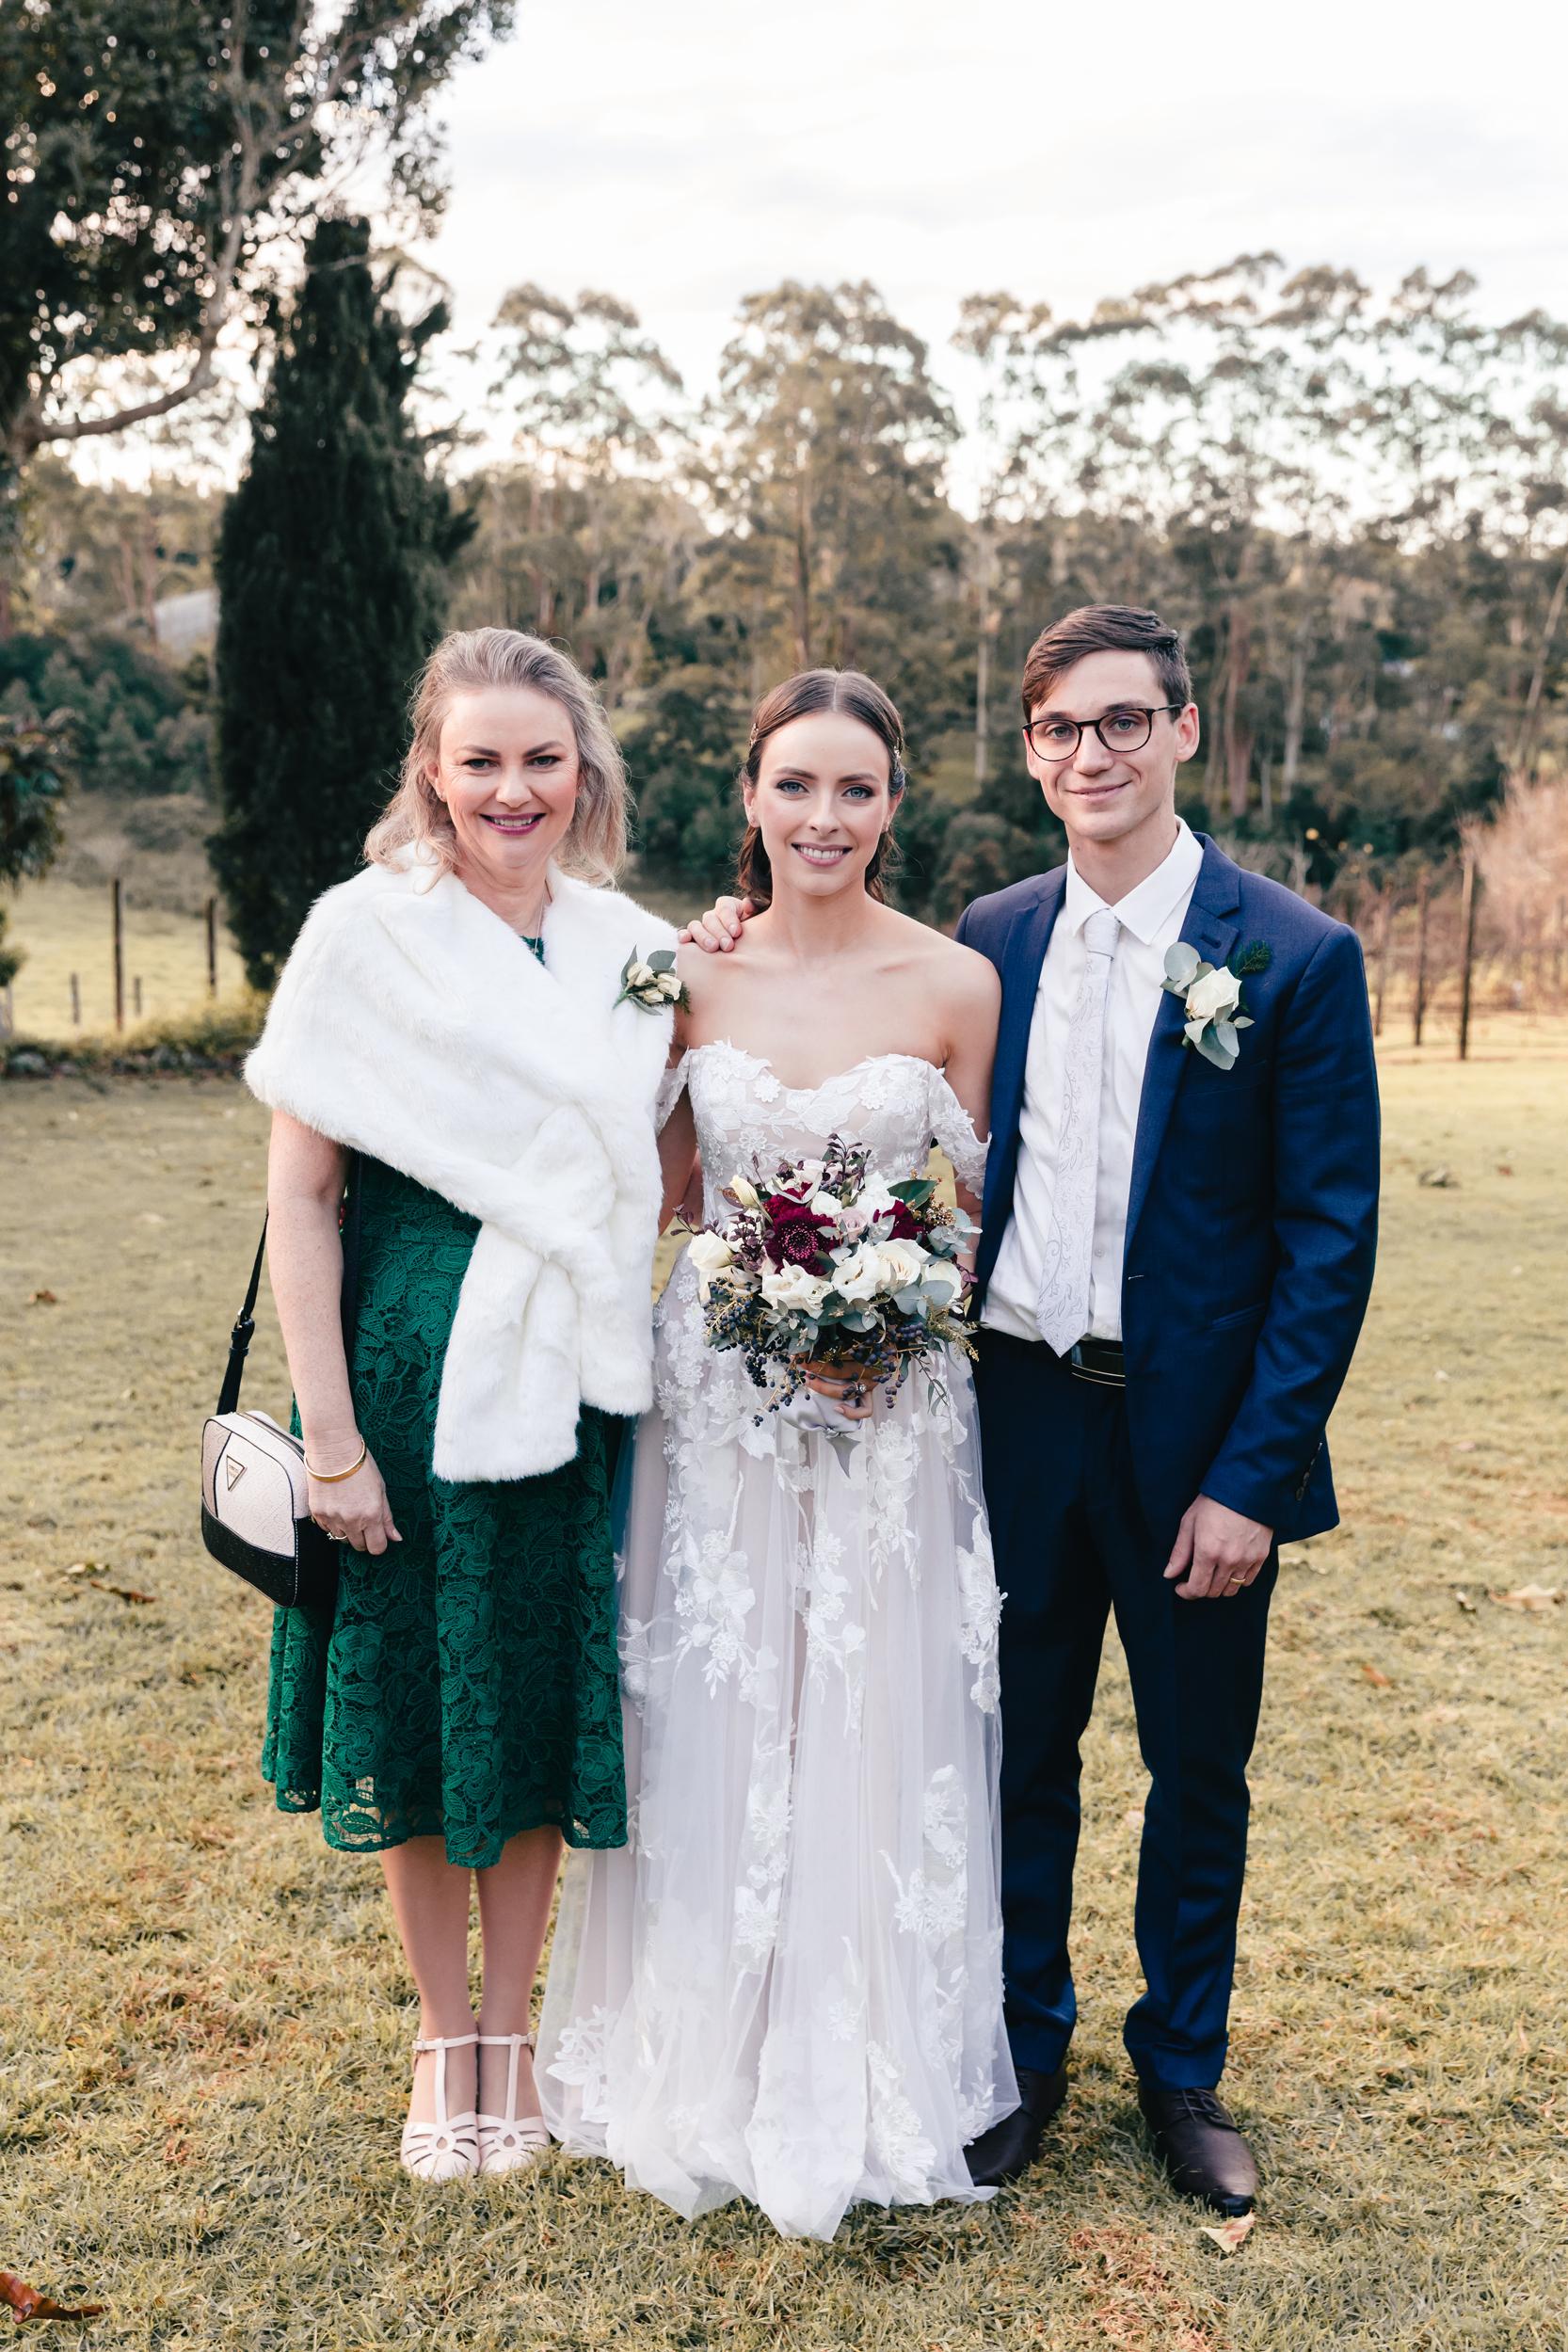 Olivia & Andrew Wedding_Group Photos-32.jpg